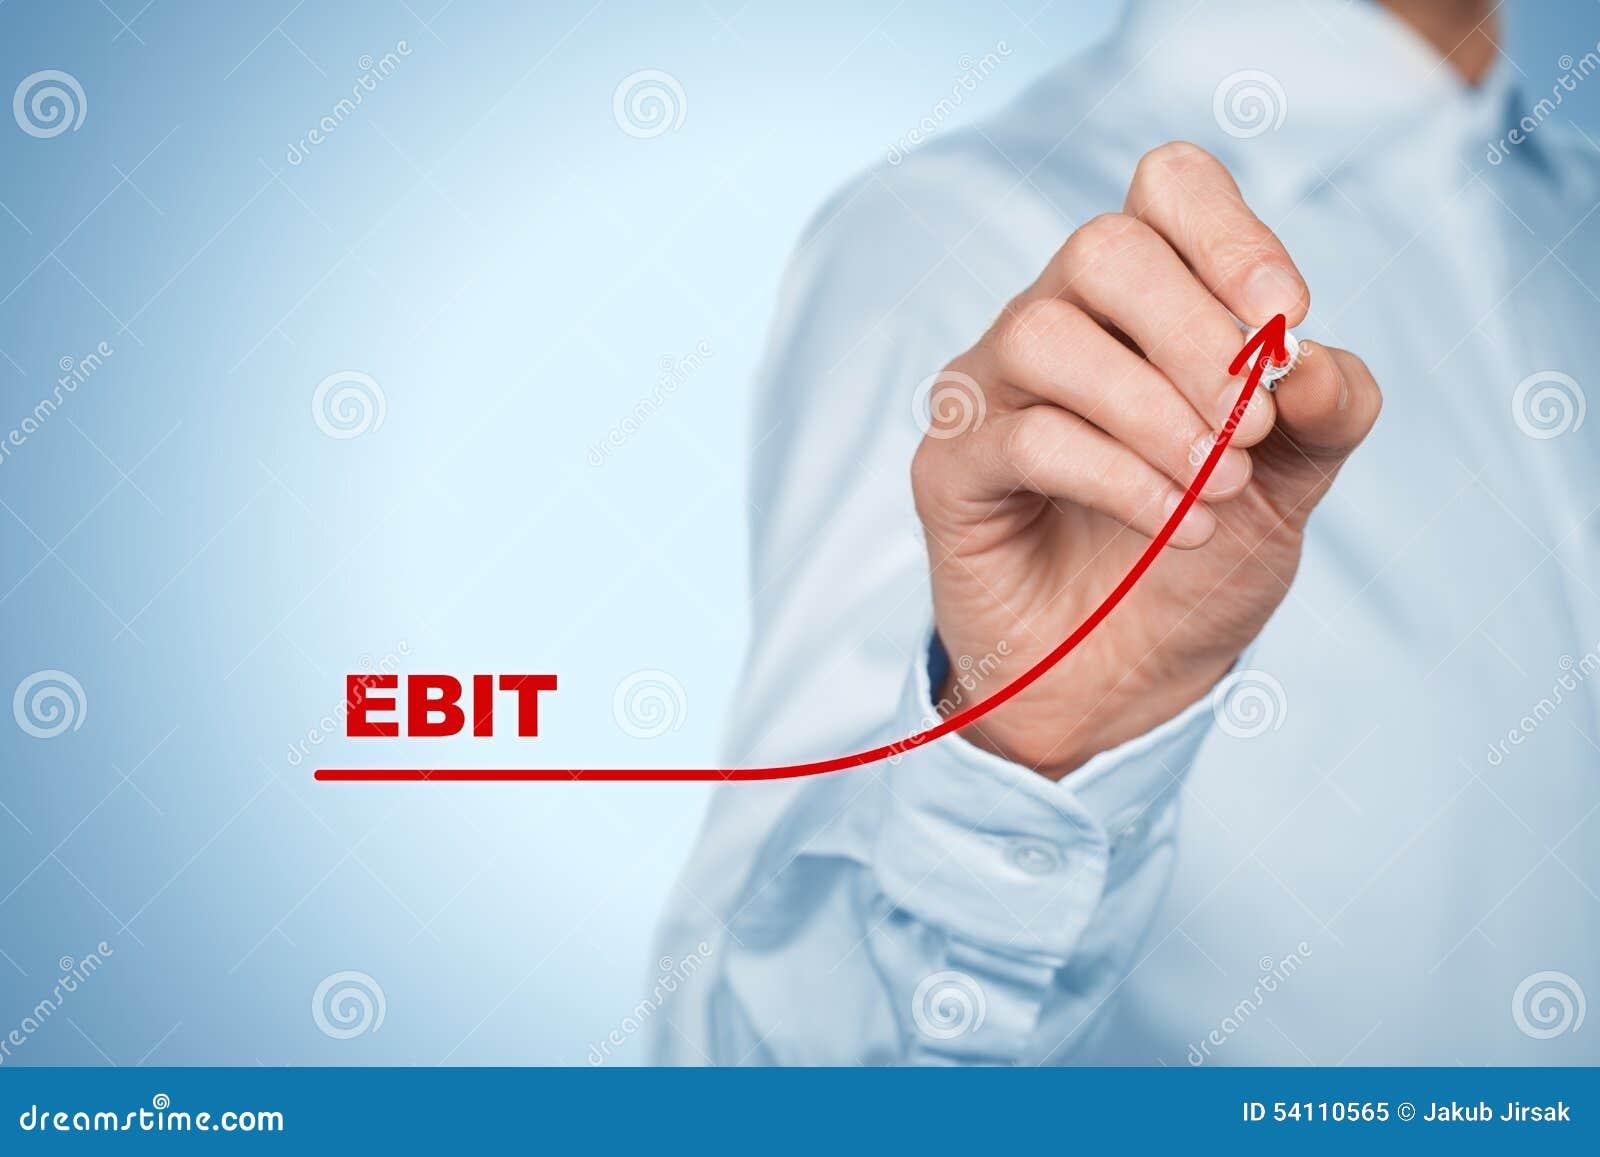 Ebit Increase Stock Illustration Image 54110565